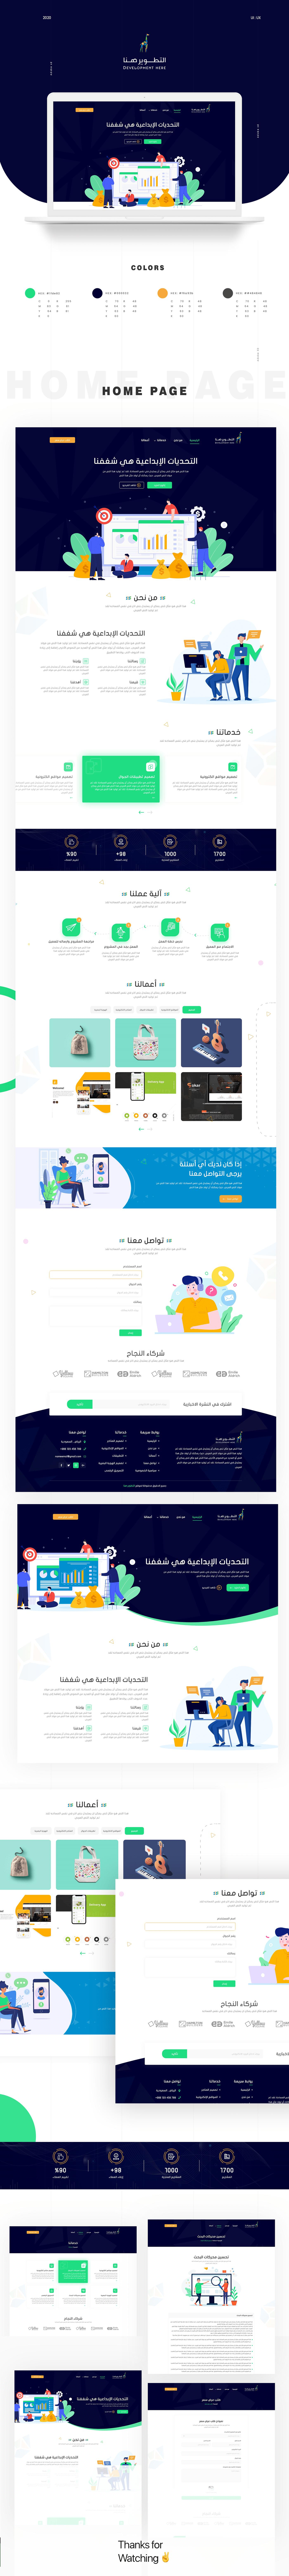 agency app homepage landingpage Sokar uiux Web Webdesign Website